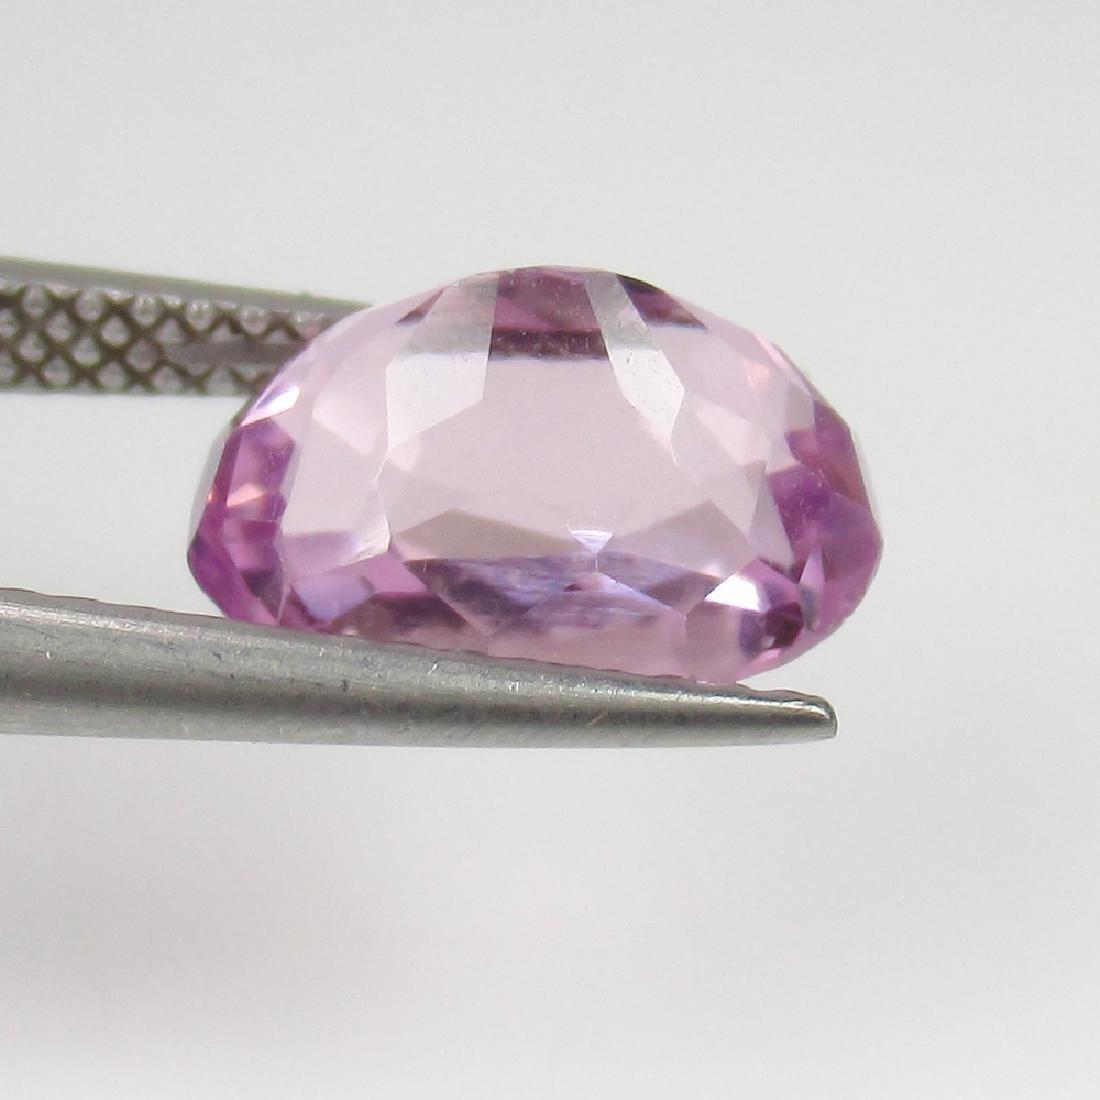 3.55 Ct IGI Certified Genuine Brazil Pink Spodumene - 4